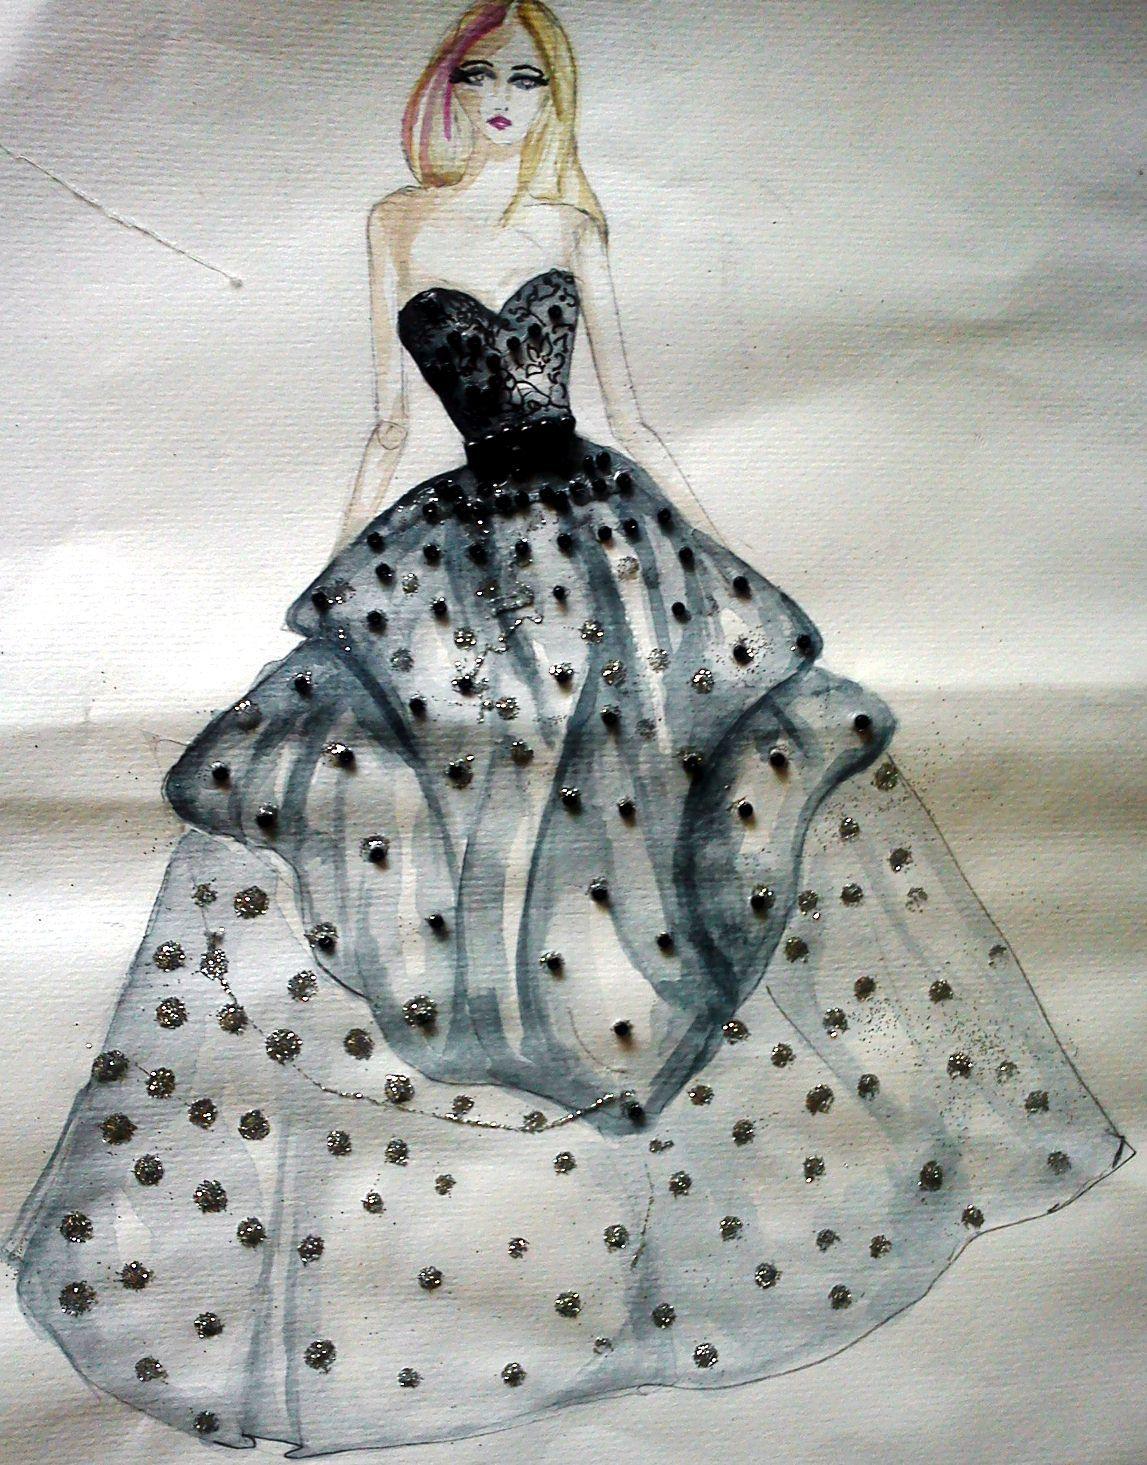 Final Punk rock princess - image 3 - student project